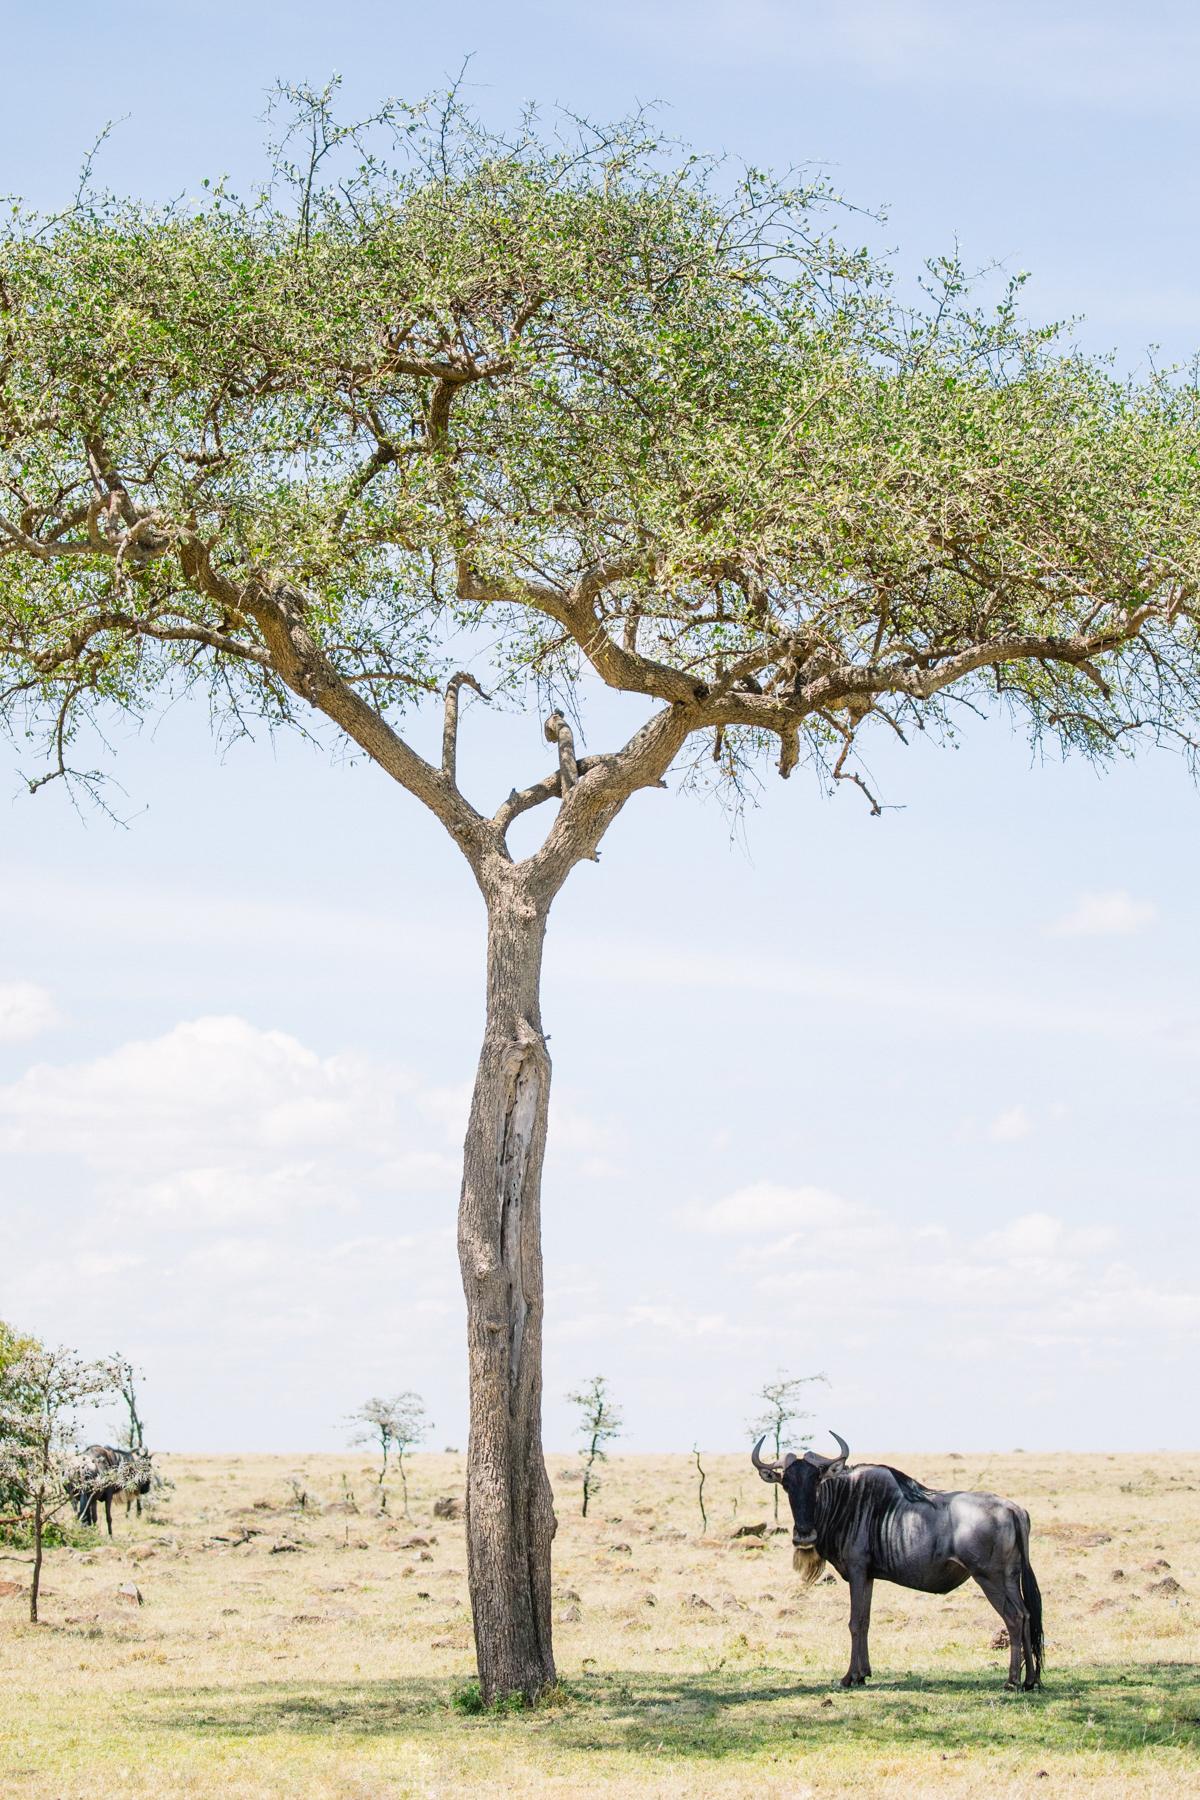 KenyaFeb2019_Safari-70.jpg